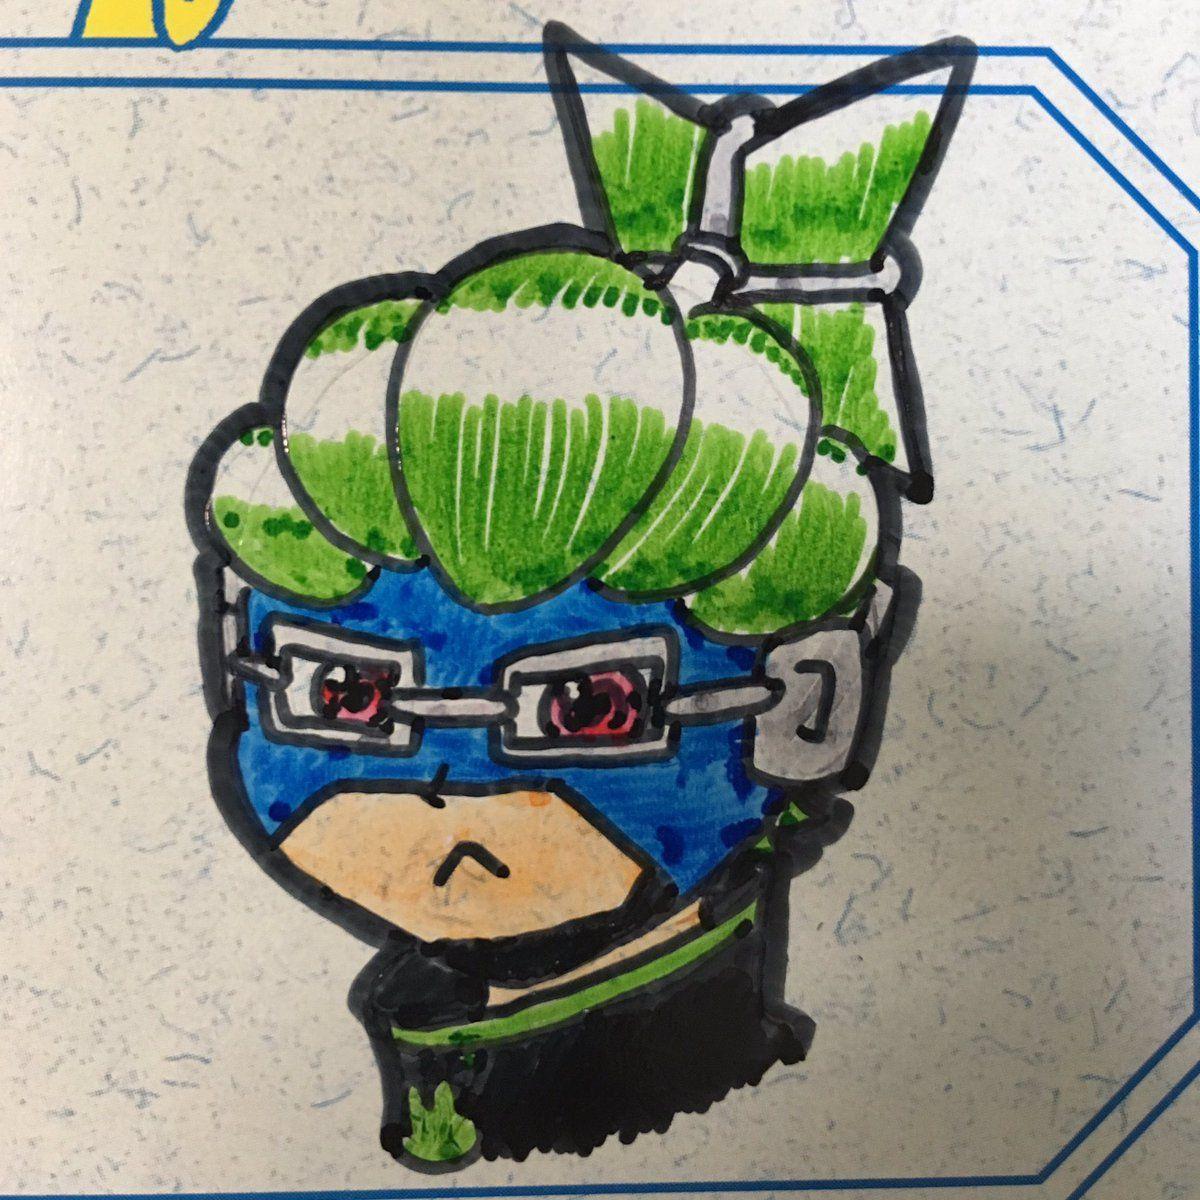 ARMS Ninjara by 瞬乃まいたけ (@Sakasa_geoglobe)   Twitter